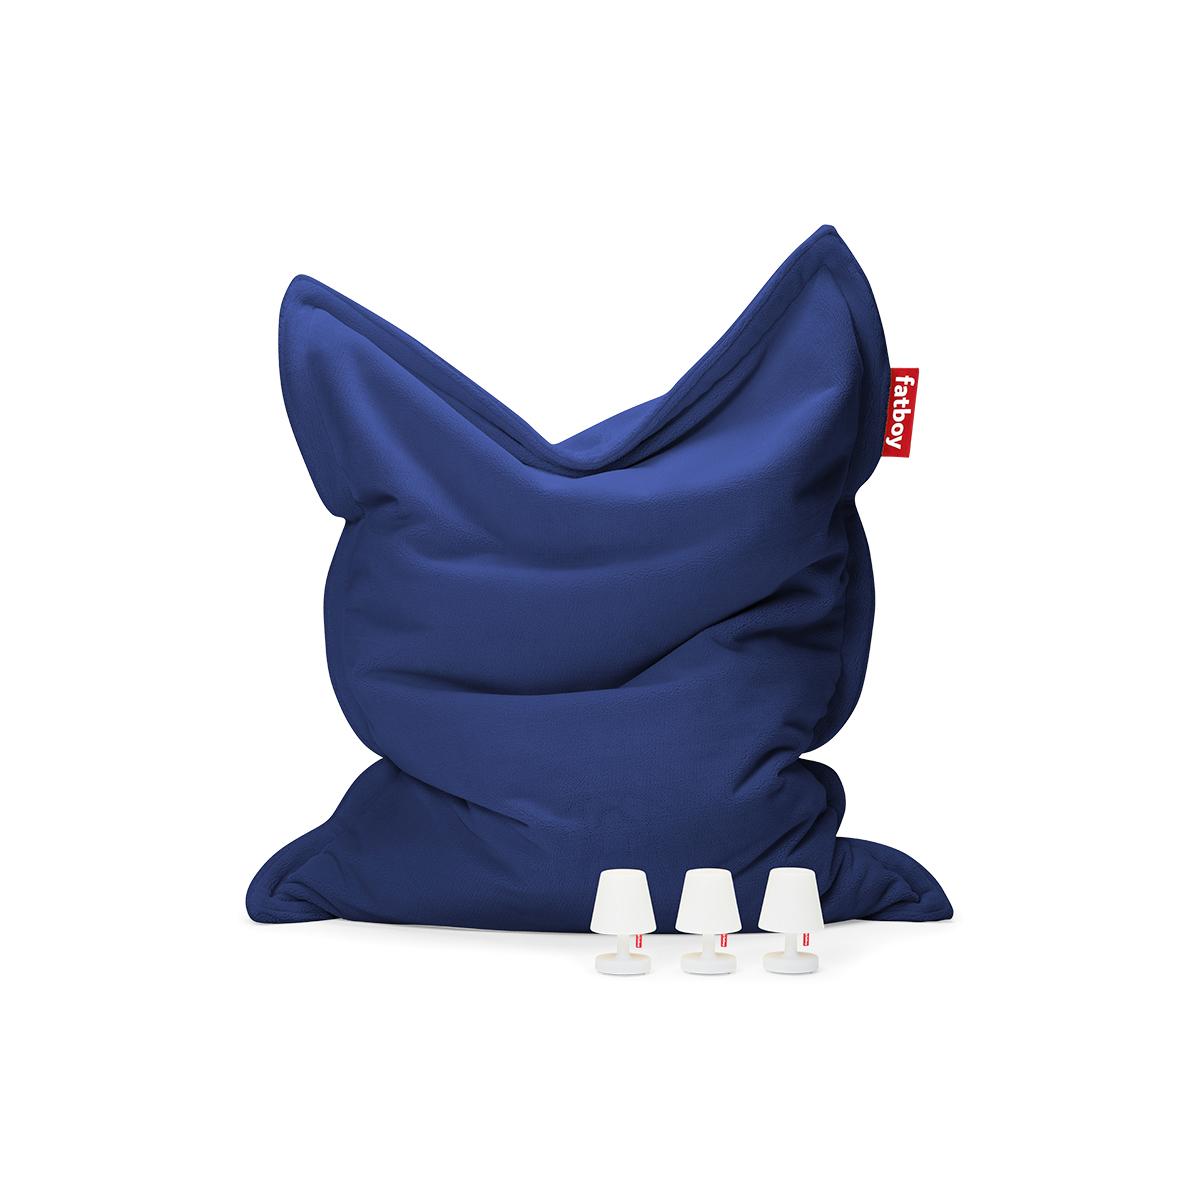 8719773032003 FATBOY Teddy royalblue packshotplus 01